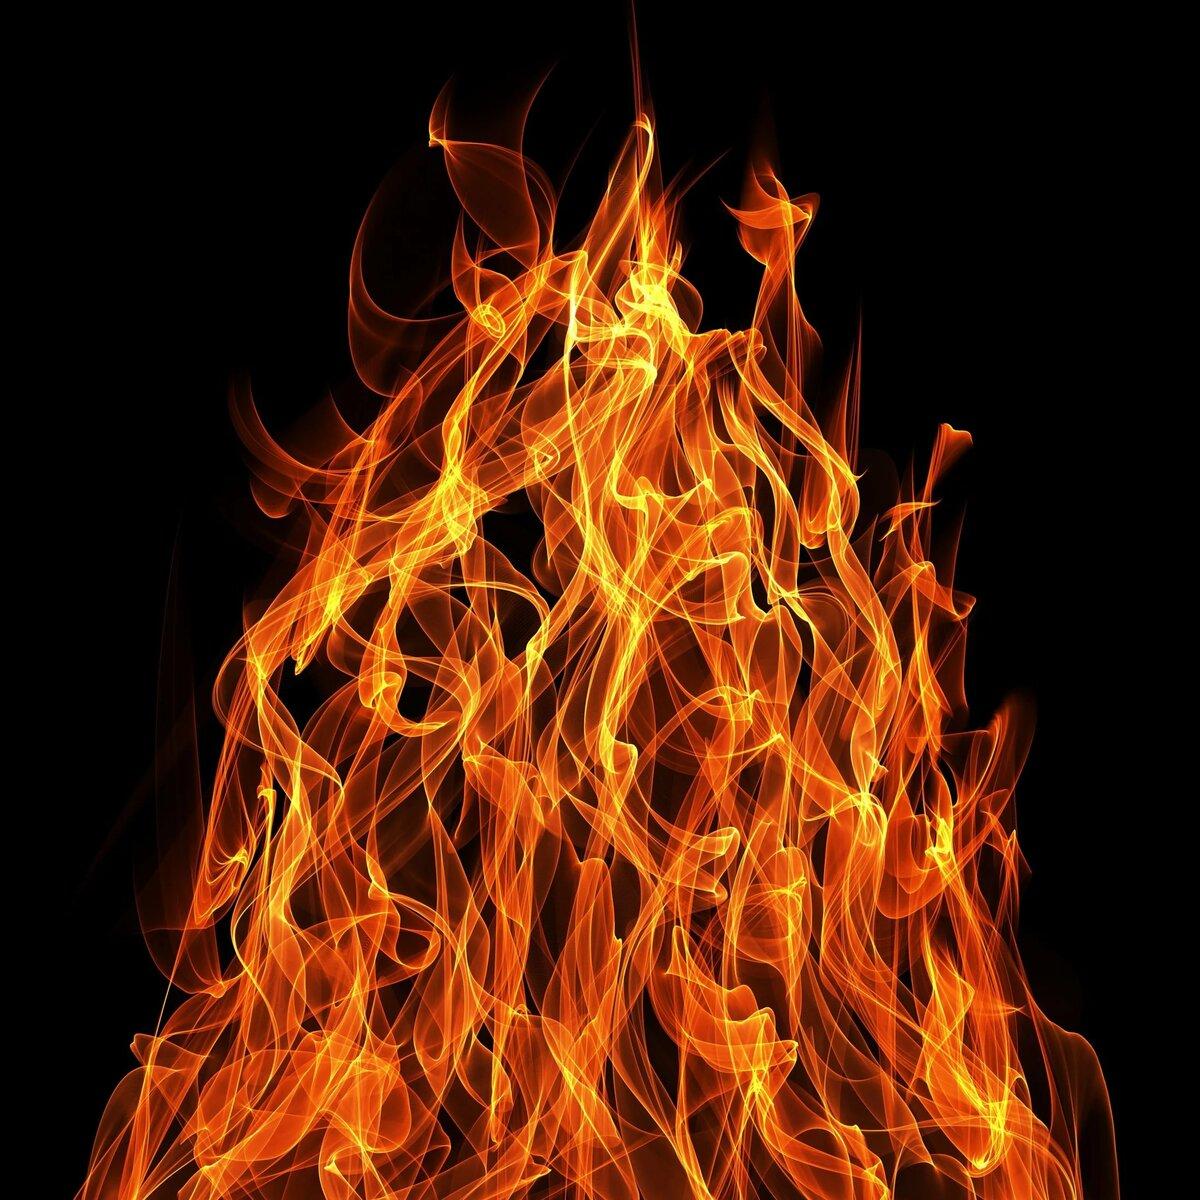 Картинки про огонь